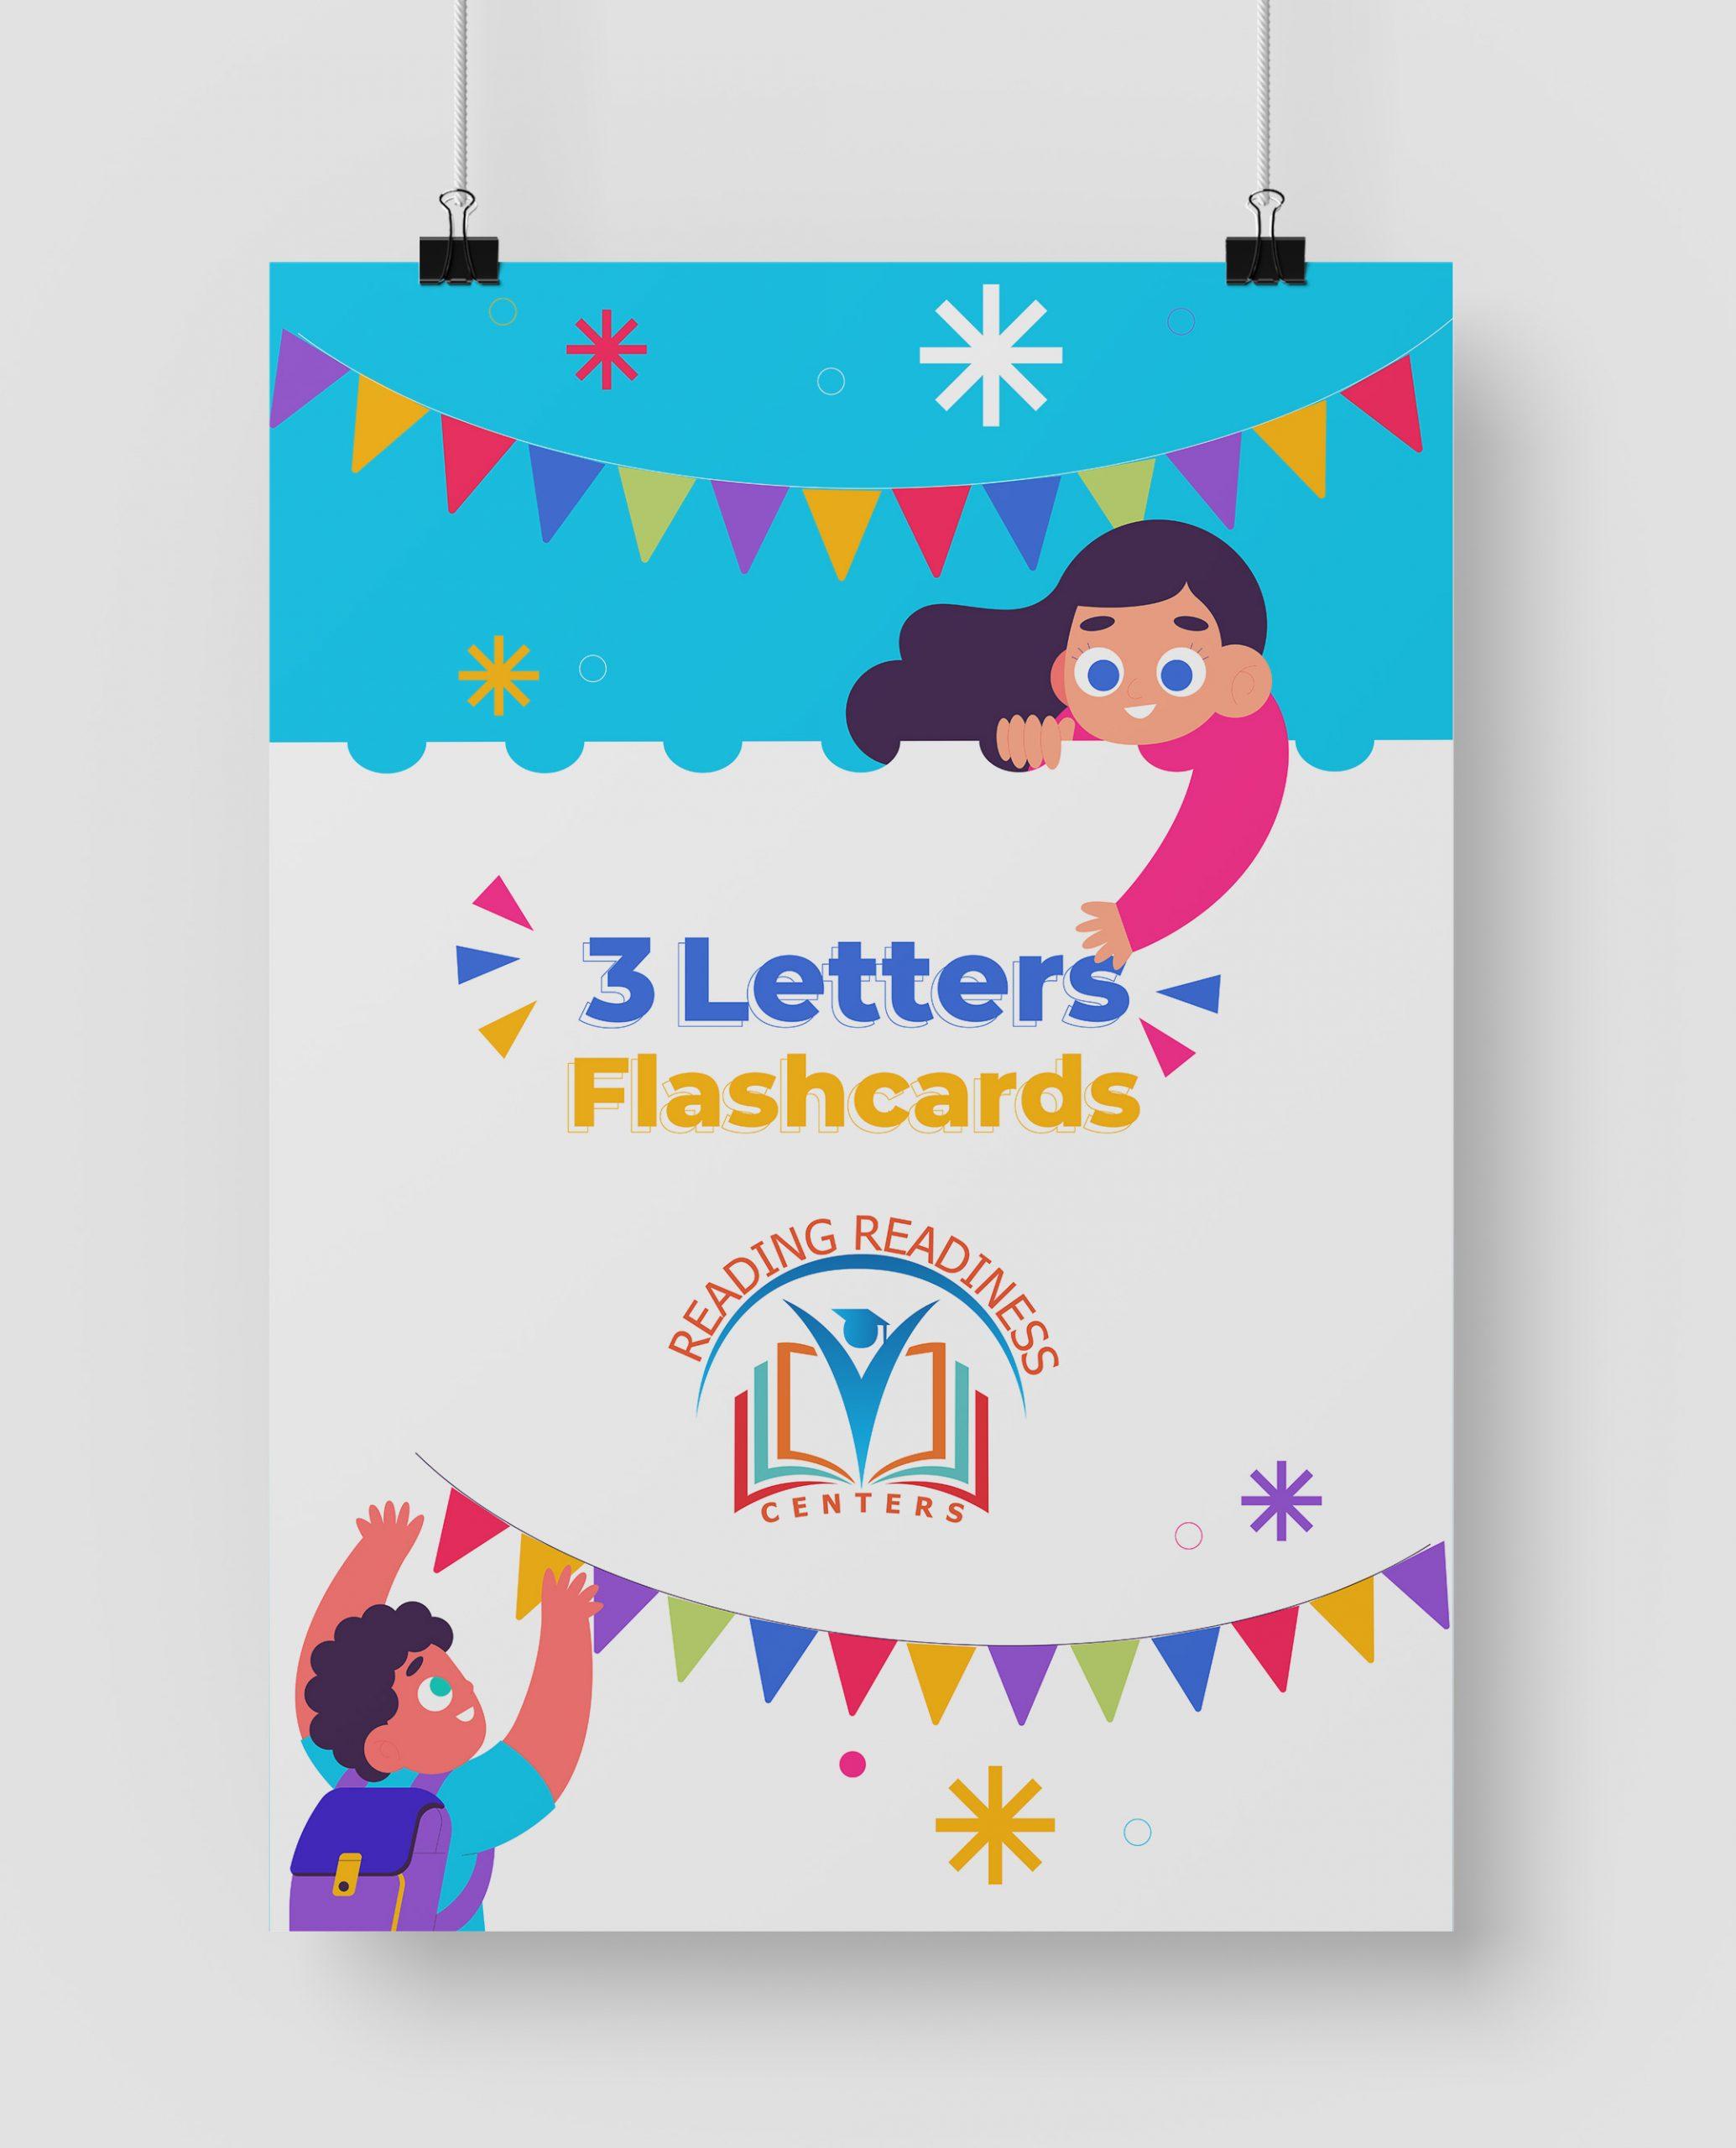 Letter Flashcards in Mockup